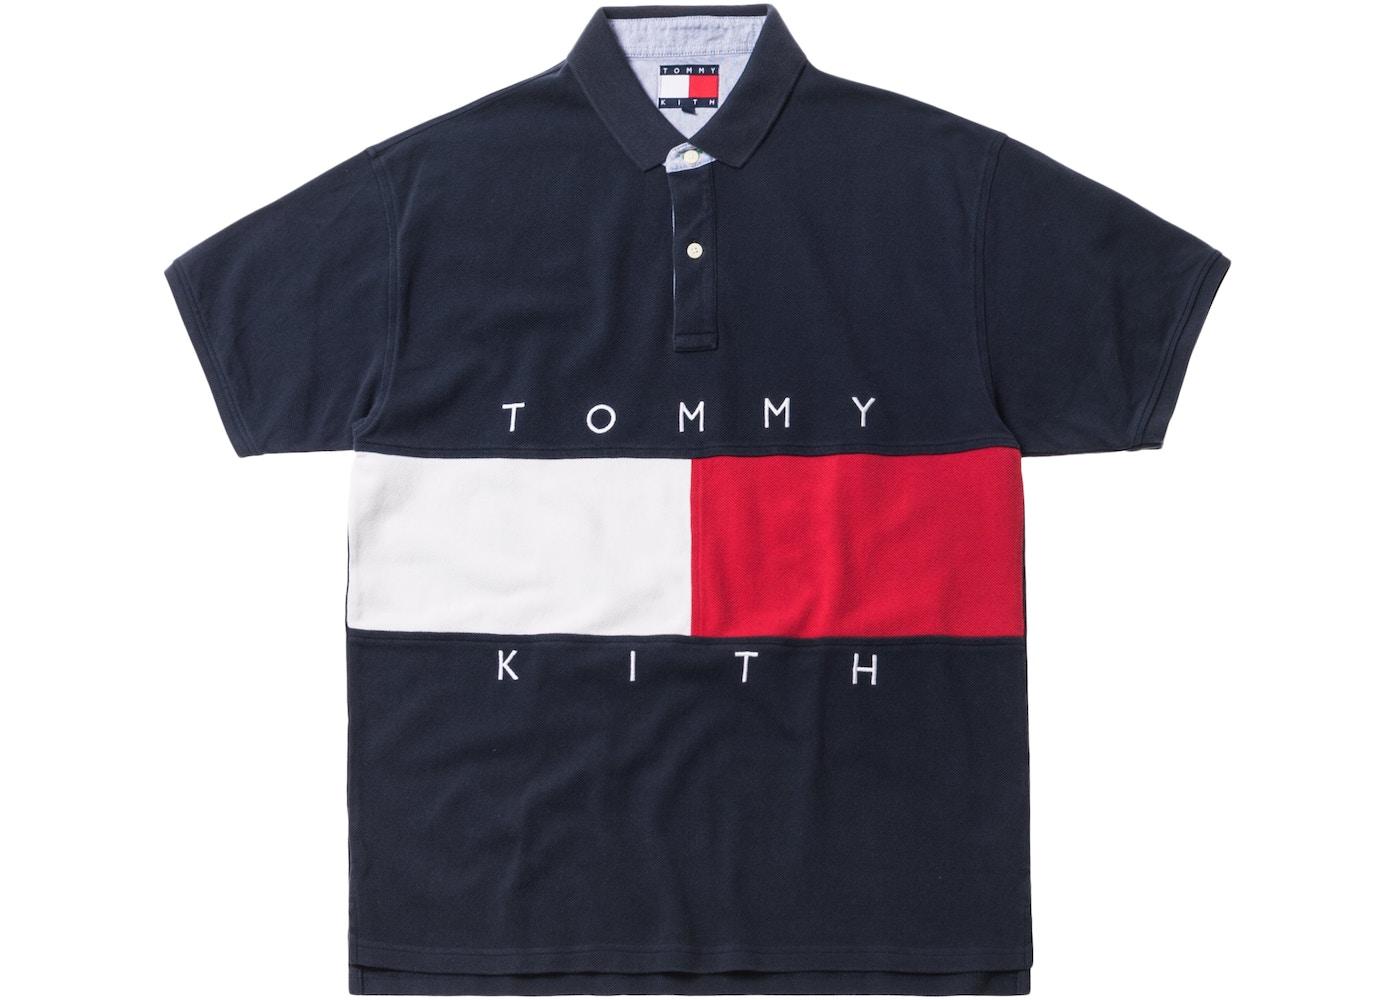 52ba570e Kith Tops/Sweatshirts - Buy & Sell Streetwear